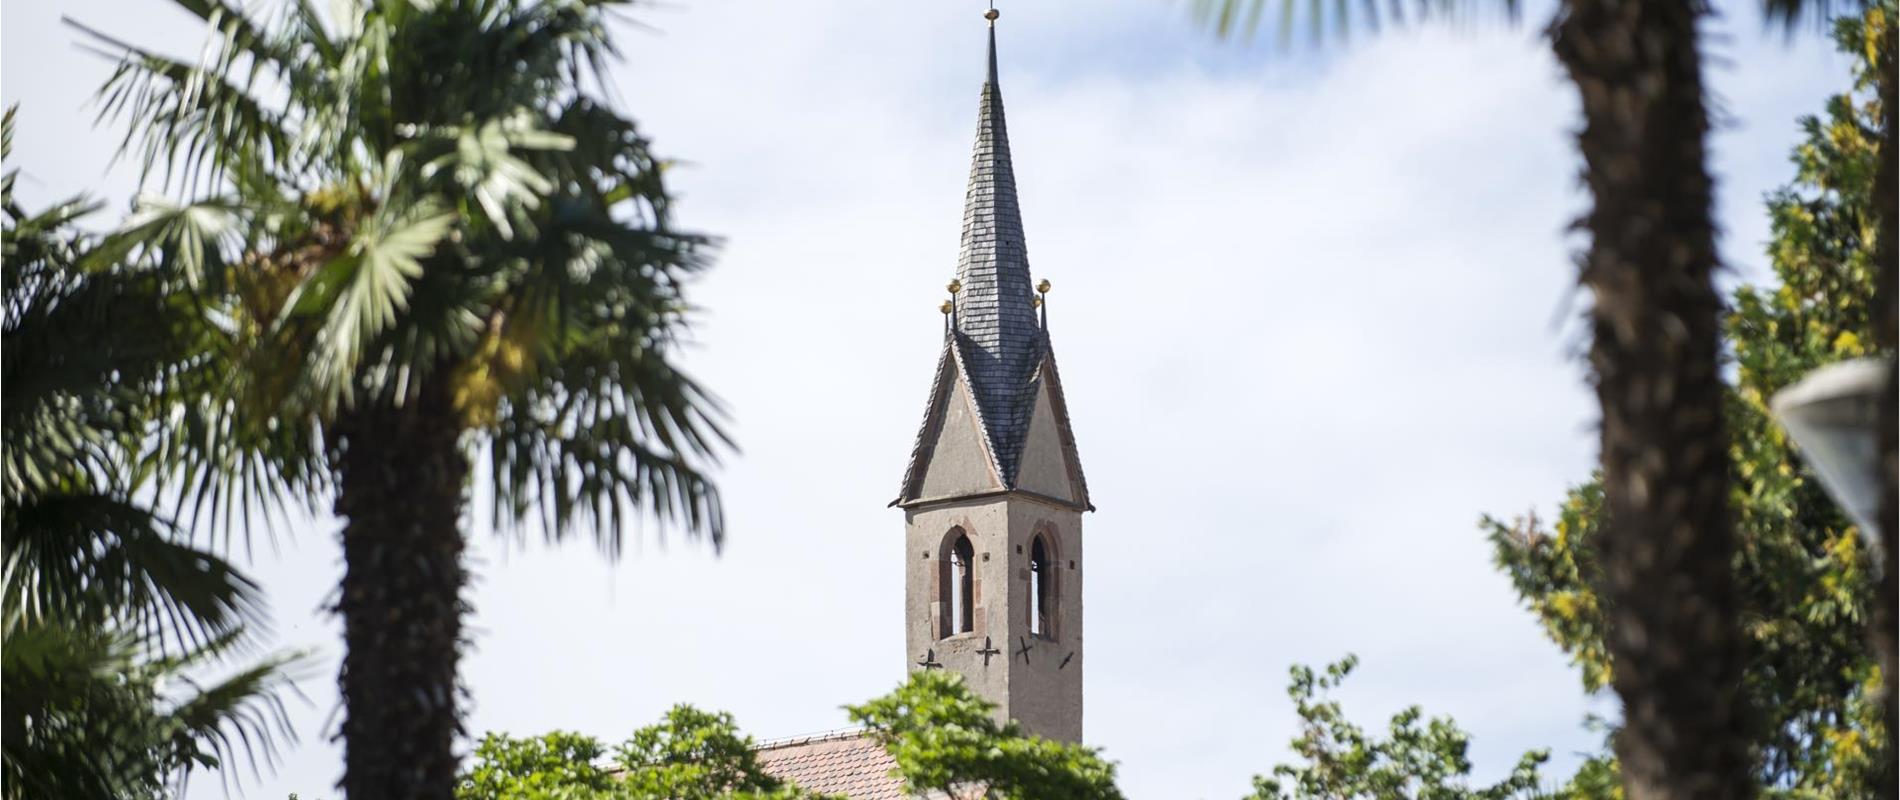 kerk dating cultuur